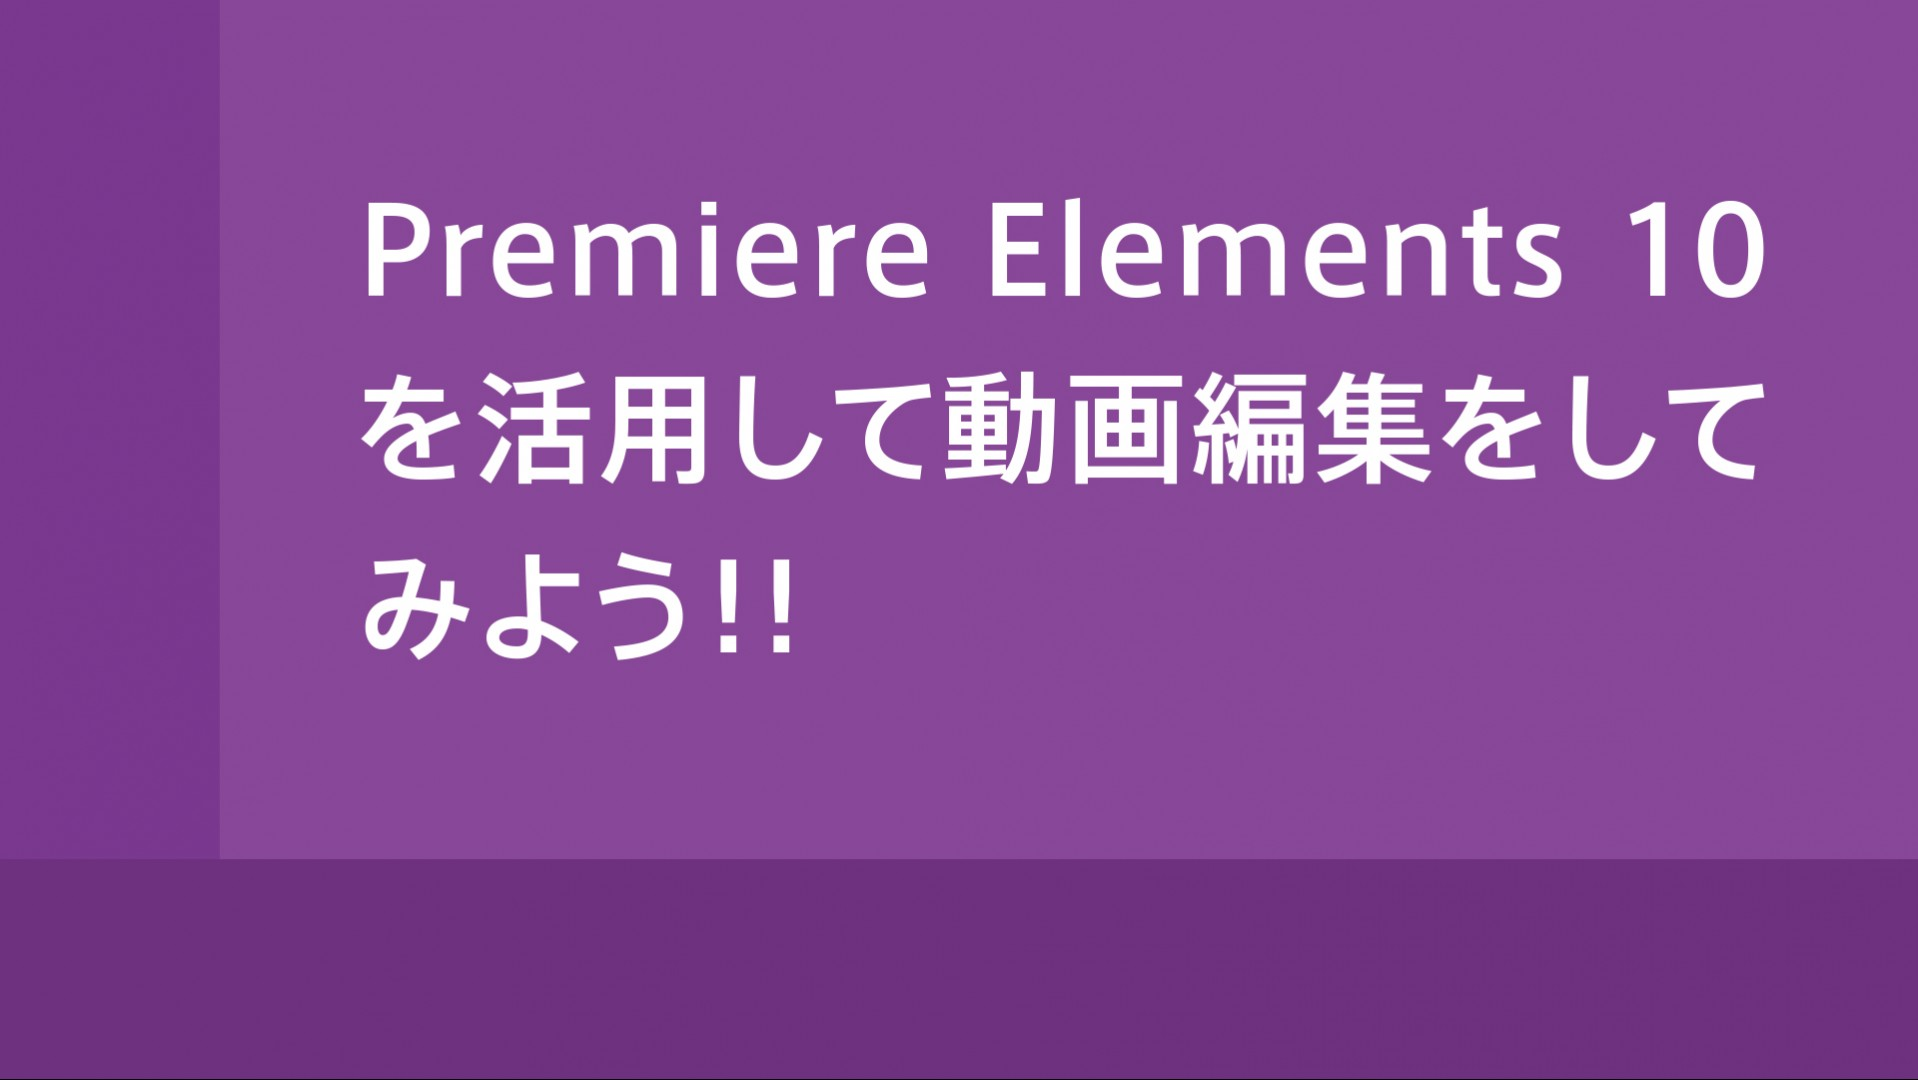 Premiere Elements 10 映像にストップモーションを設定する